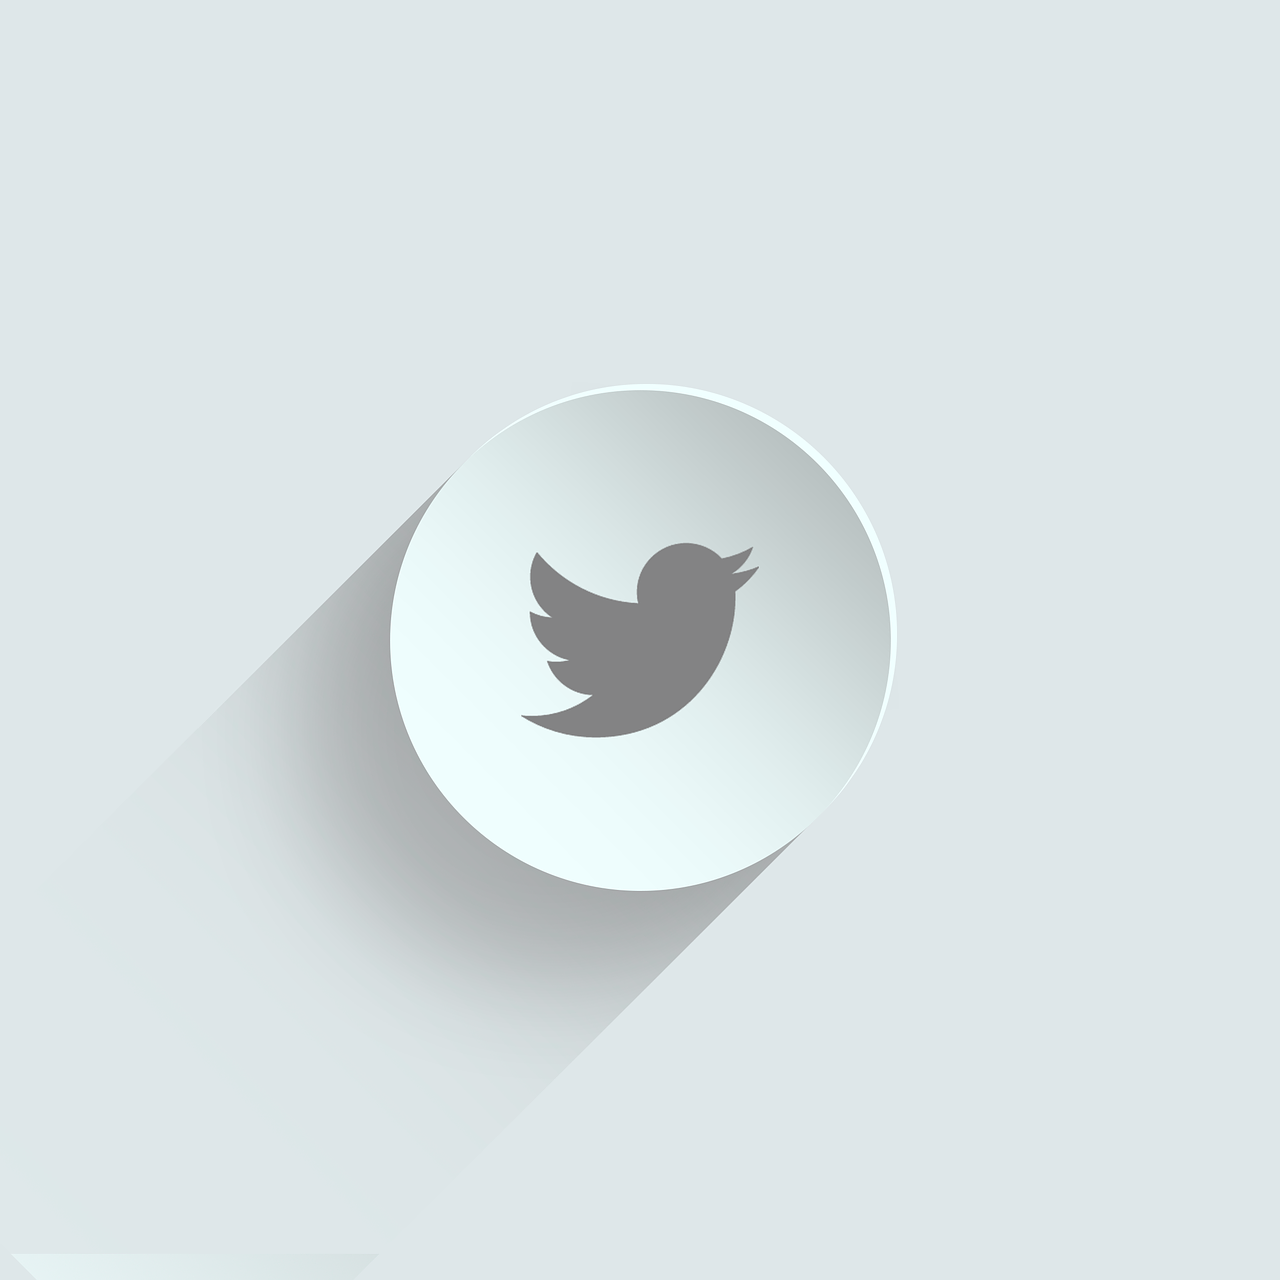 Twitterロゴのイラスト